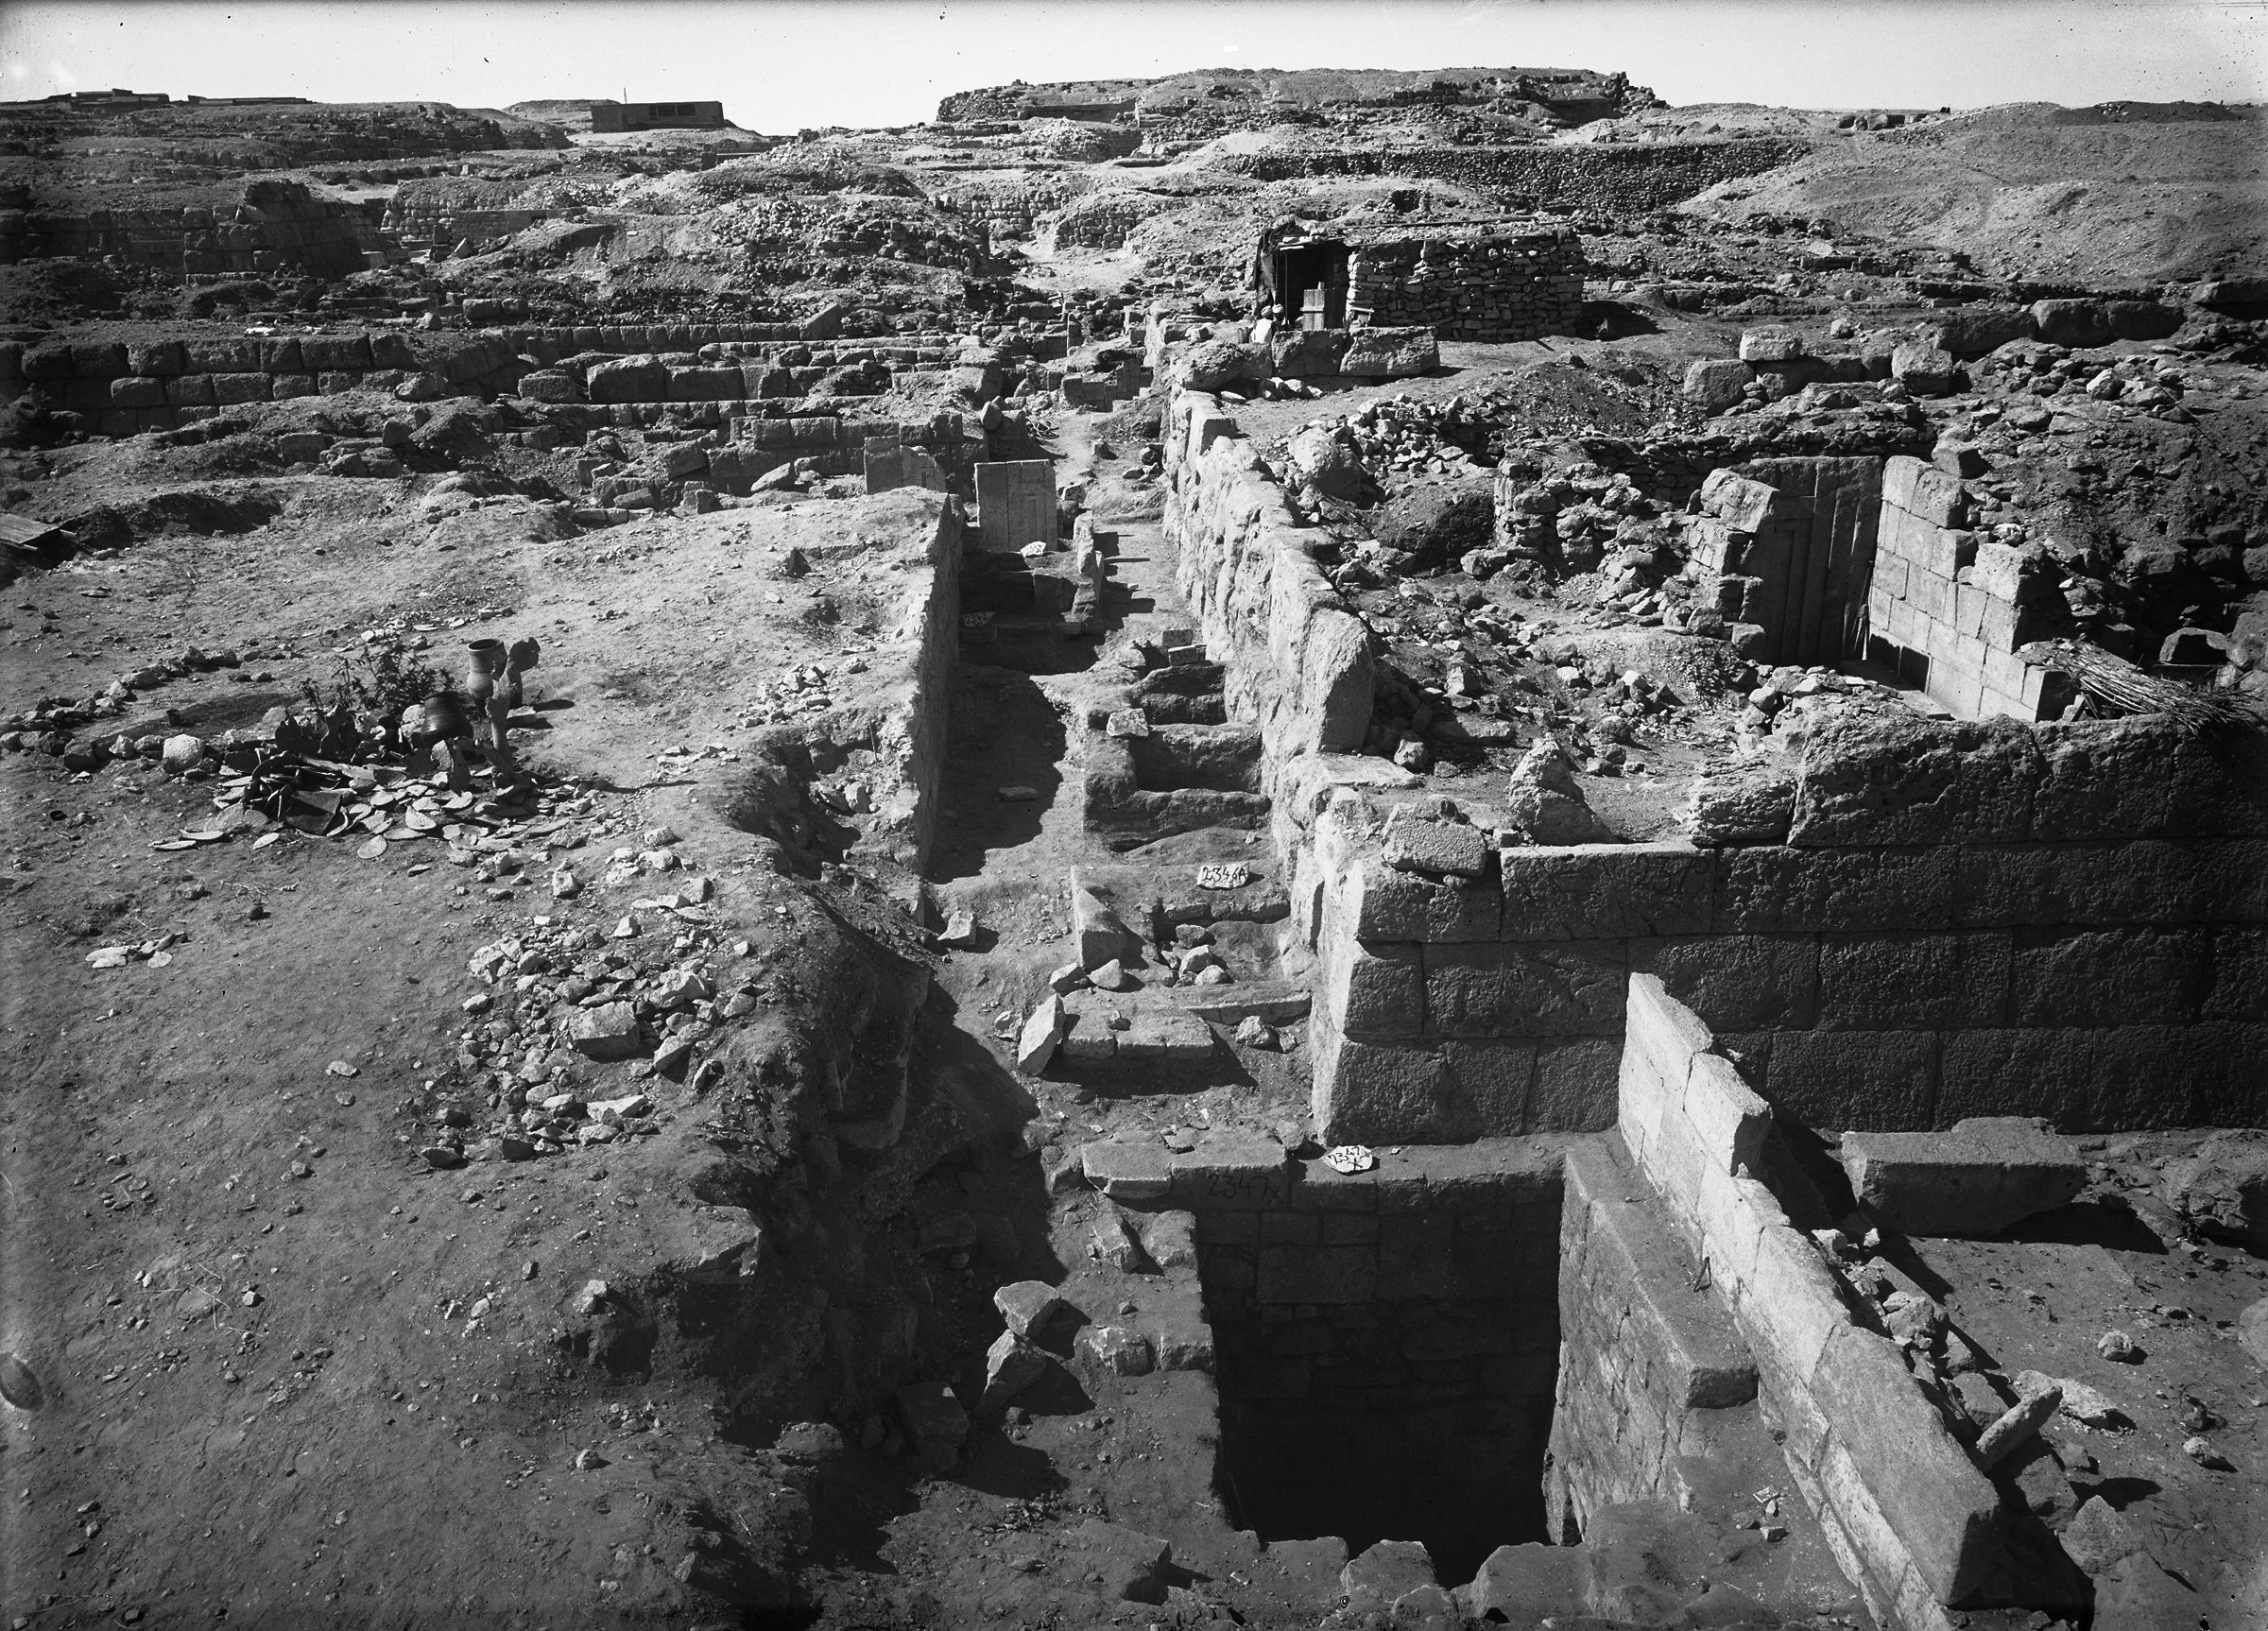 Western Cemetery: Site: Giza; View: G 2342 = G 5520, G 5522, G 2370, G 5562, G 5524, G 5523, G 5521, G 2343 = G 5511